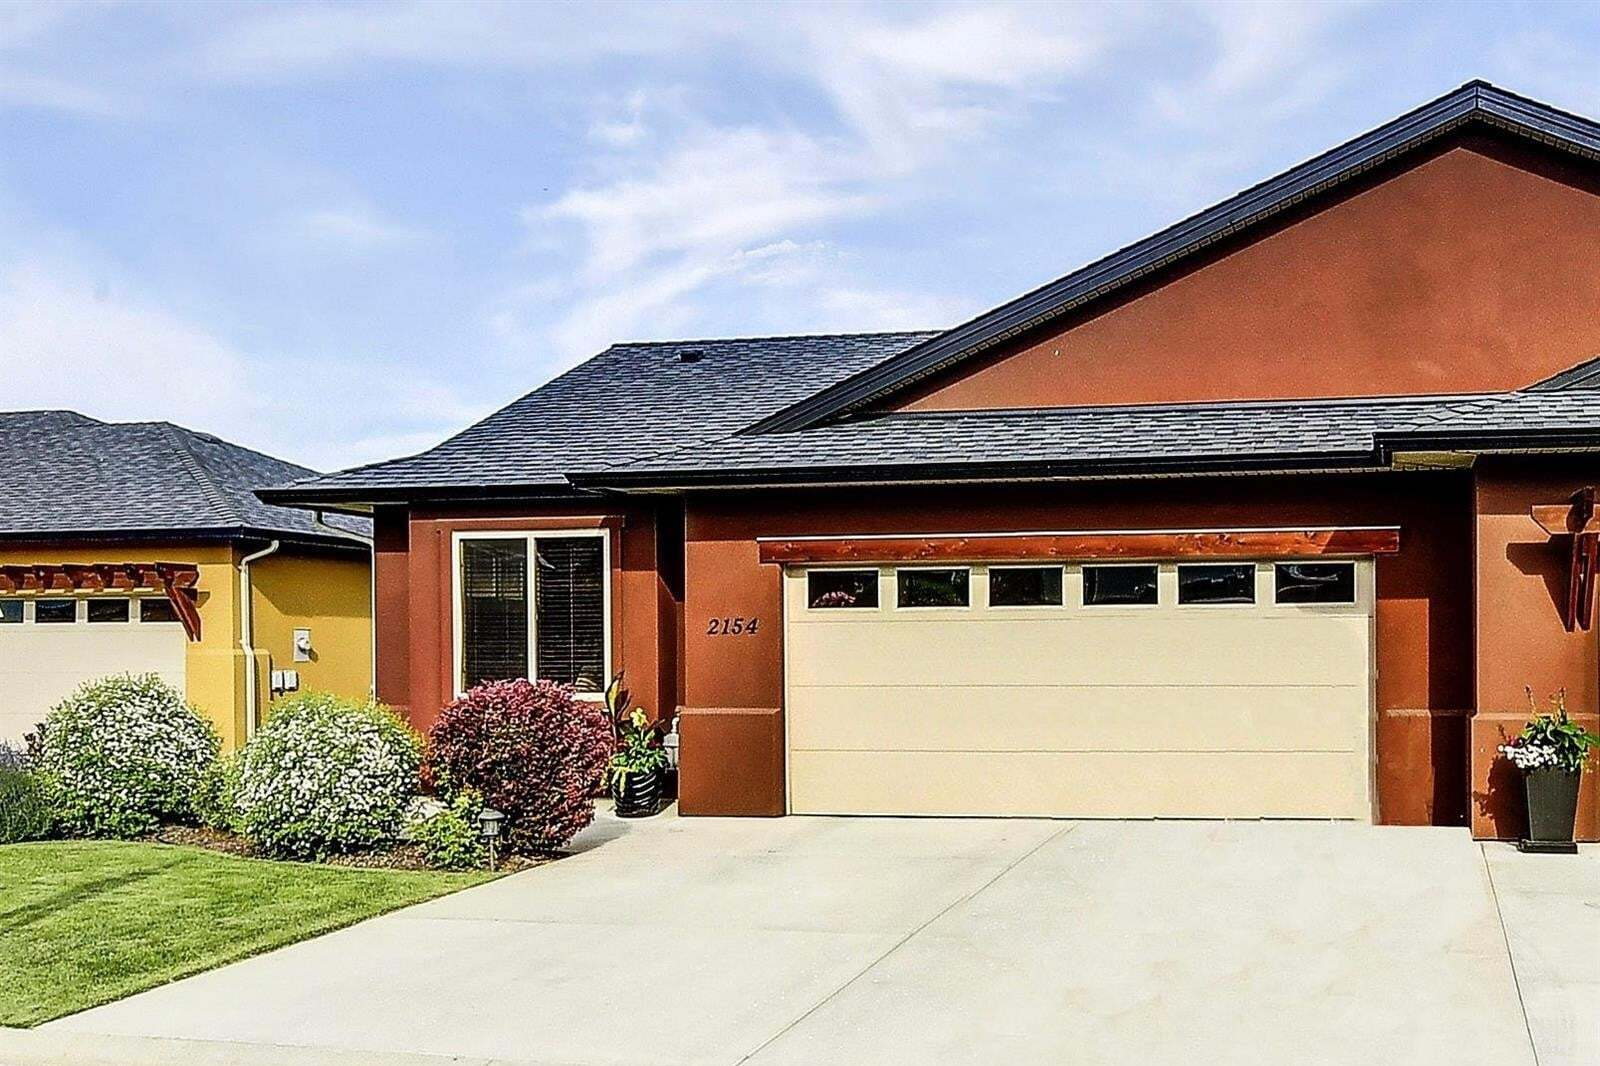 Townhouse for sale at 2154 Alvarado Tr West Kelowna British Columbia - MLS: 10205602